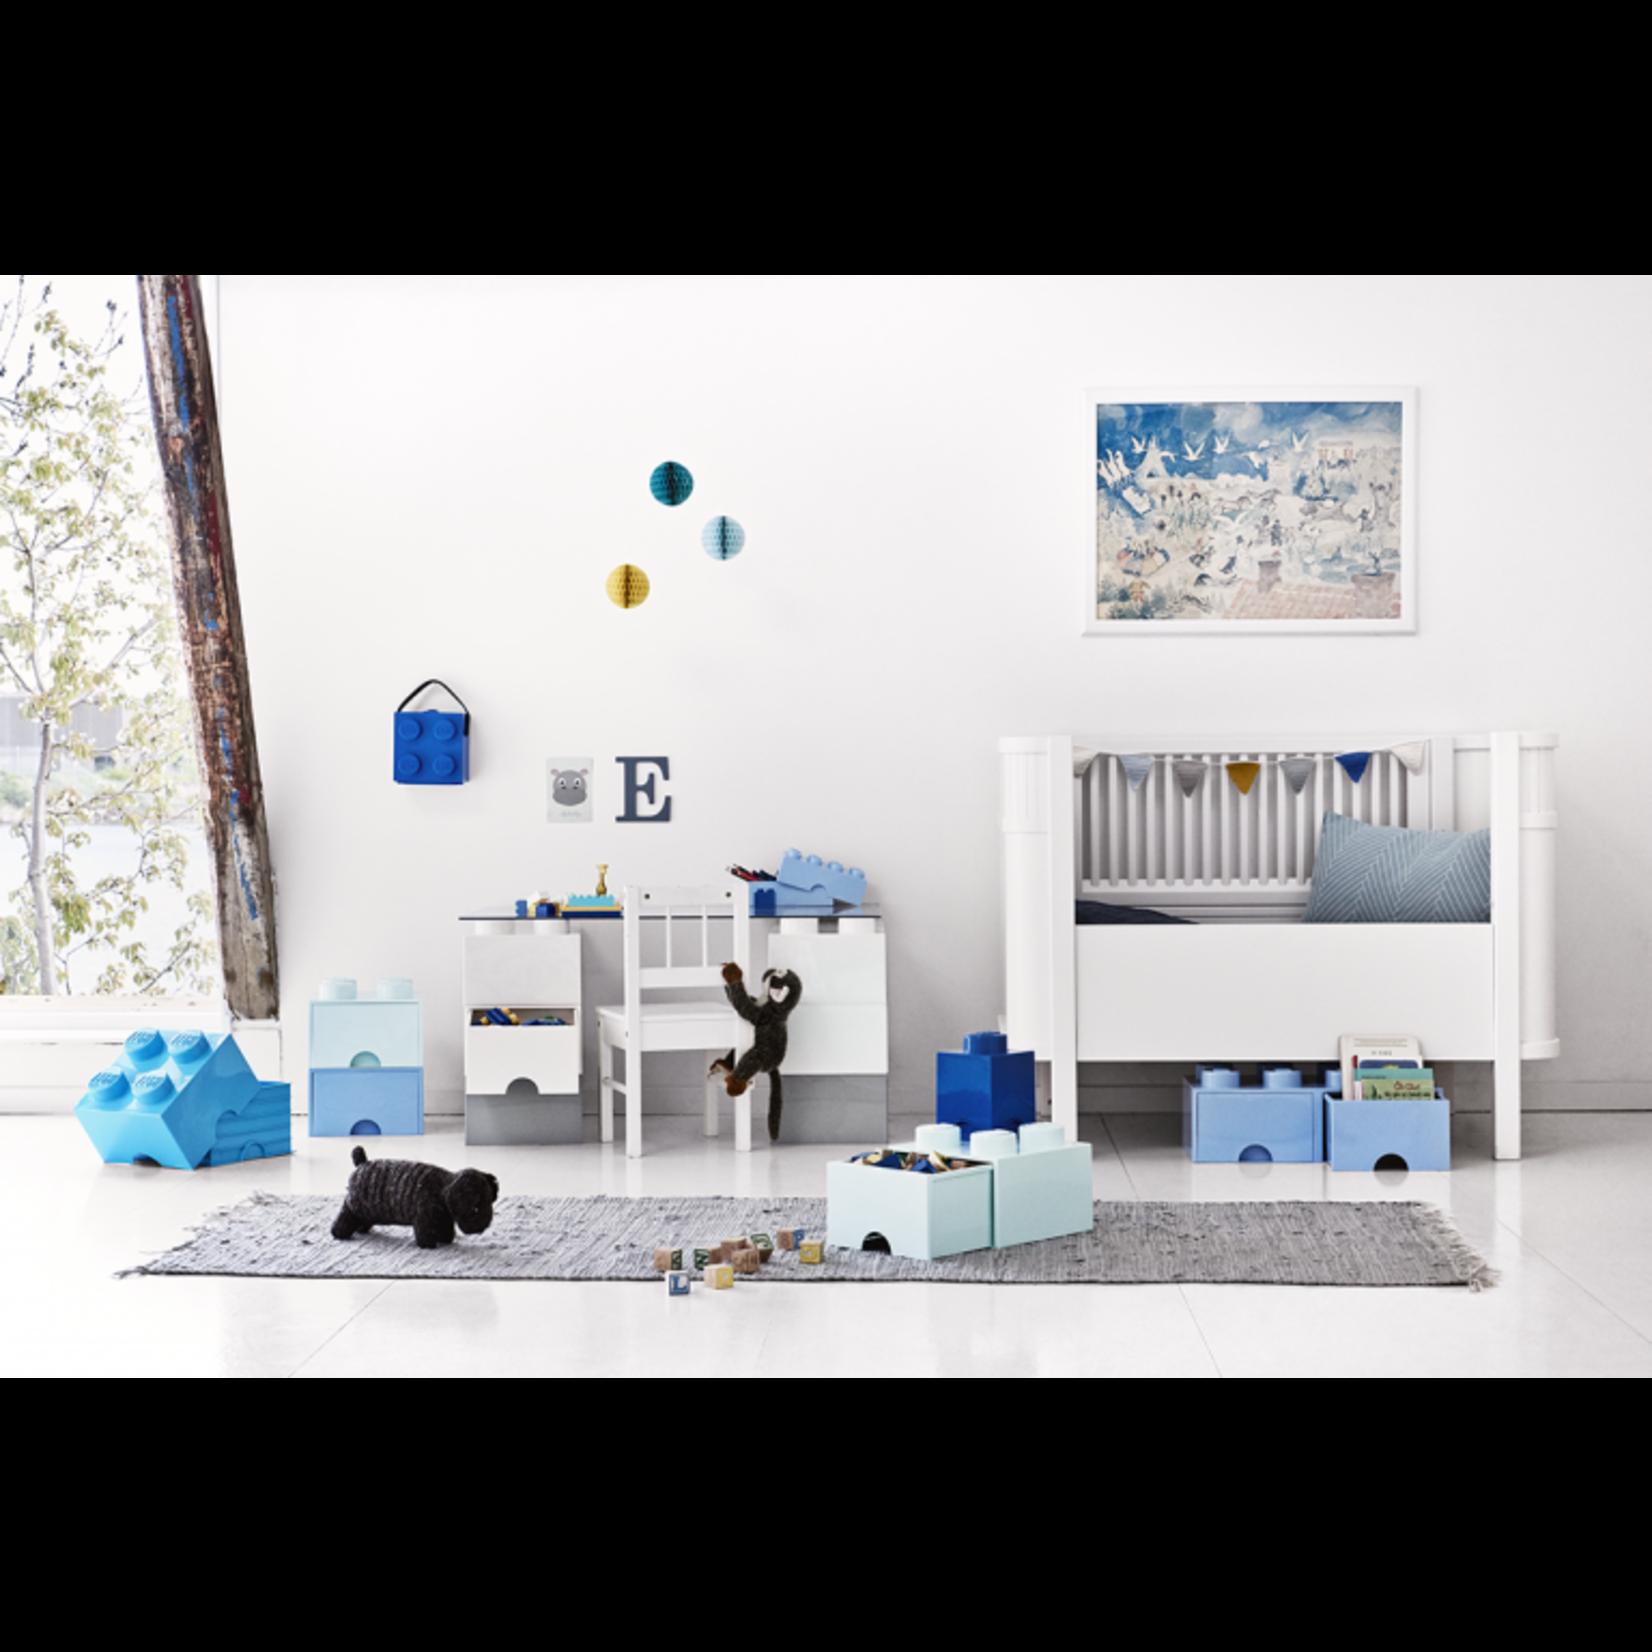 Opbergbox LEGO brick 2x2 blauw